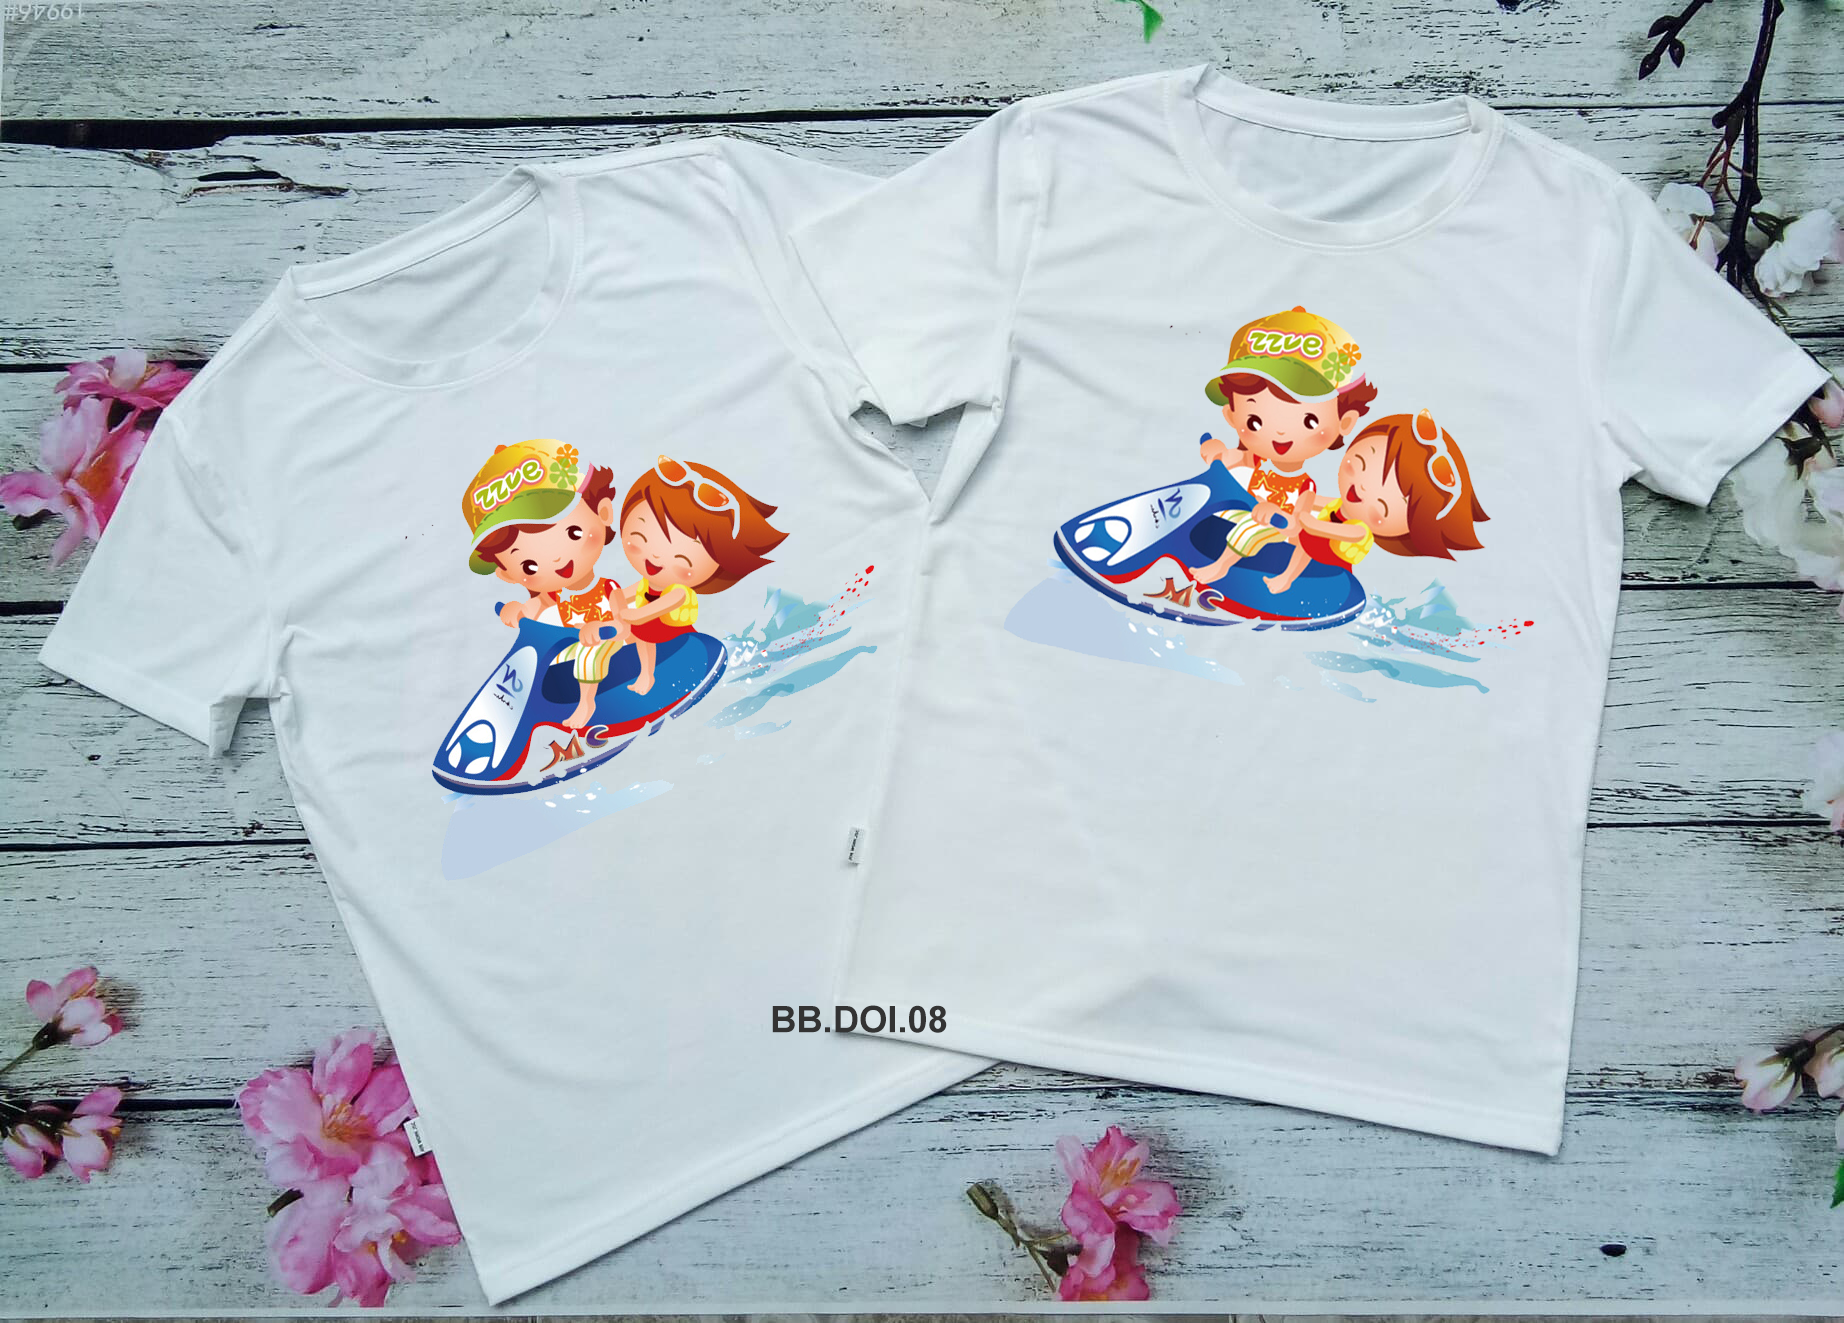 Áo cặp đôi AD85 ( BB.DOI.08)